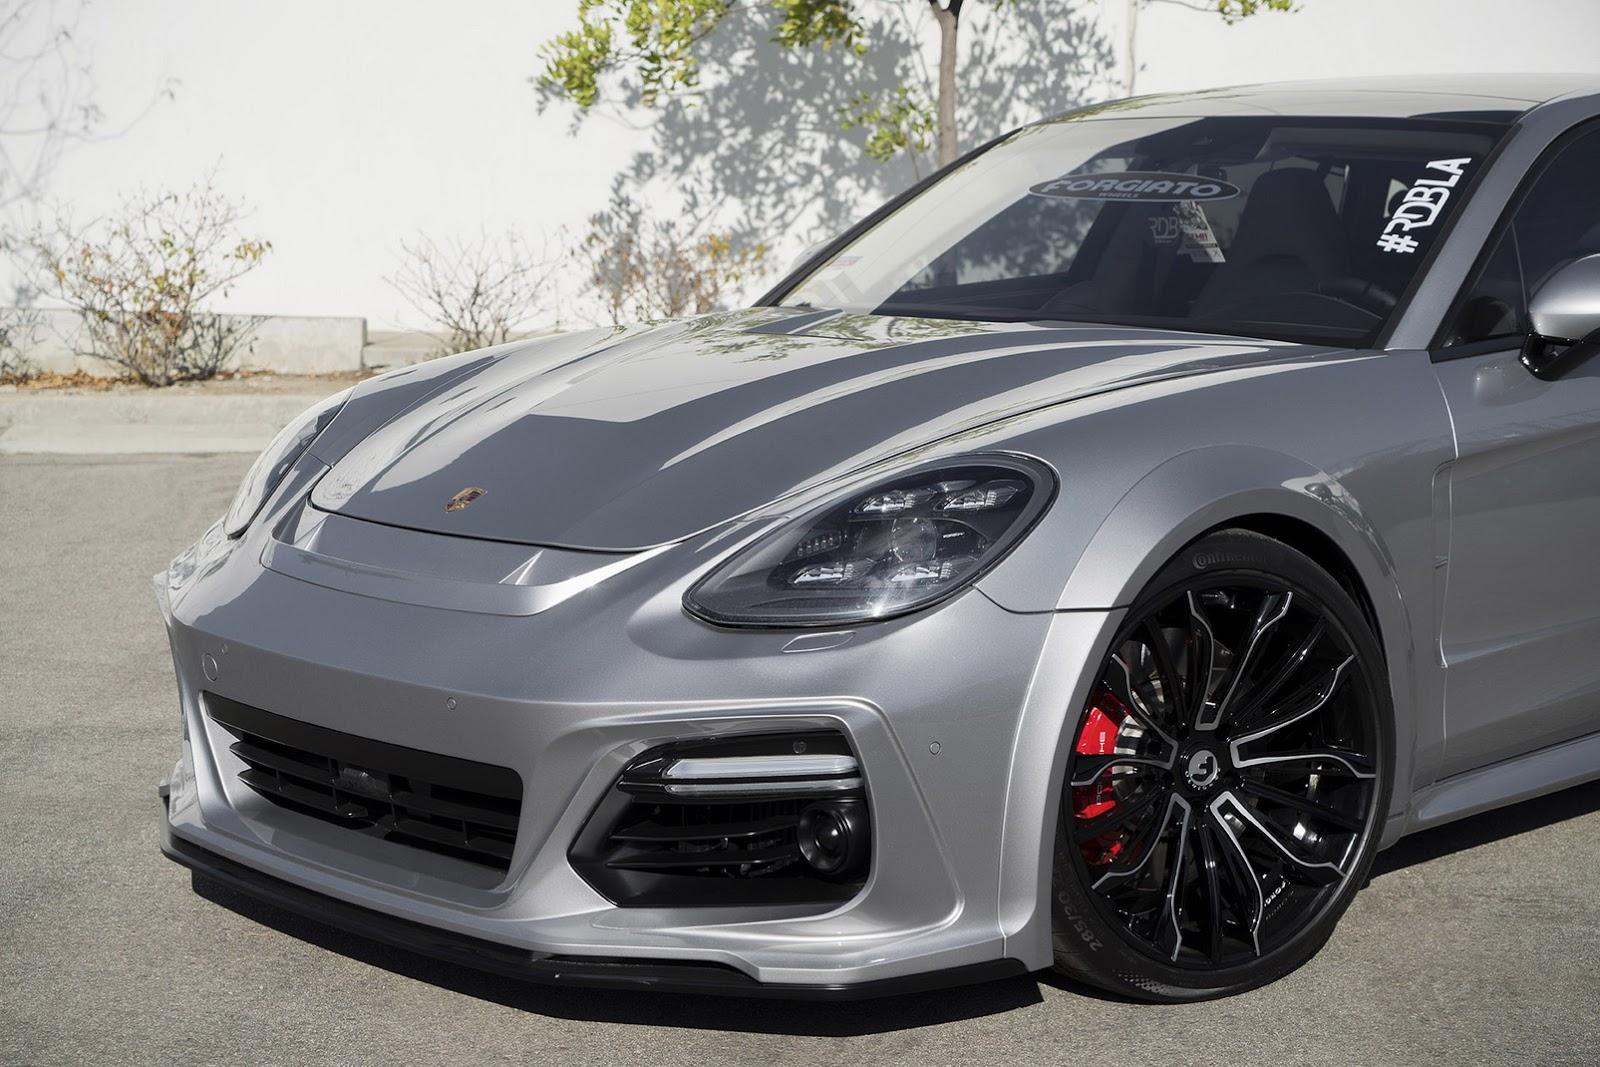 New Porsche Panamera Wears Techart Widebody Kit And